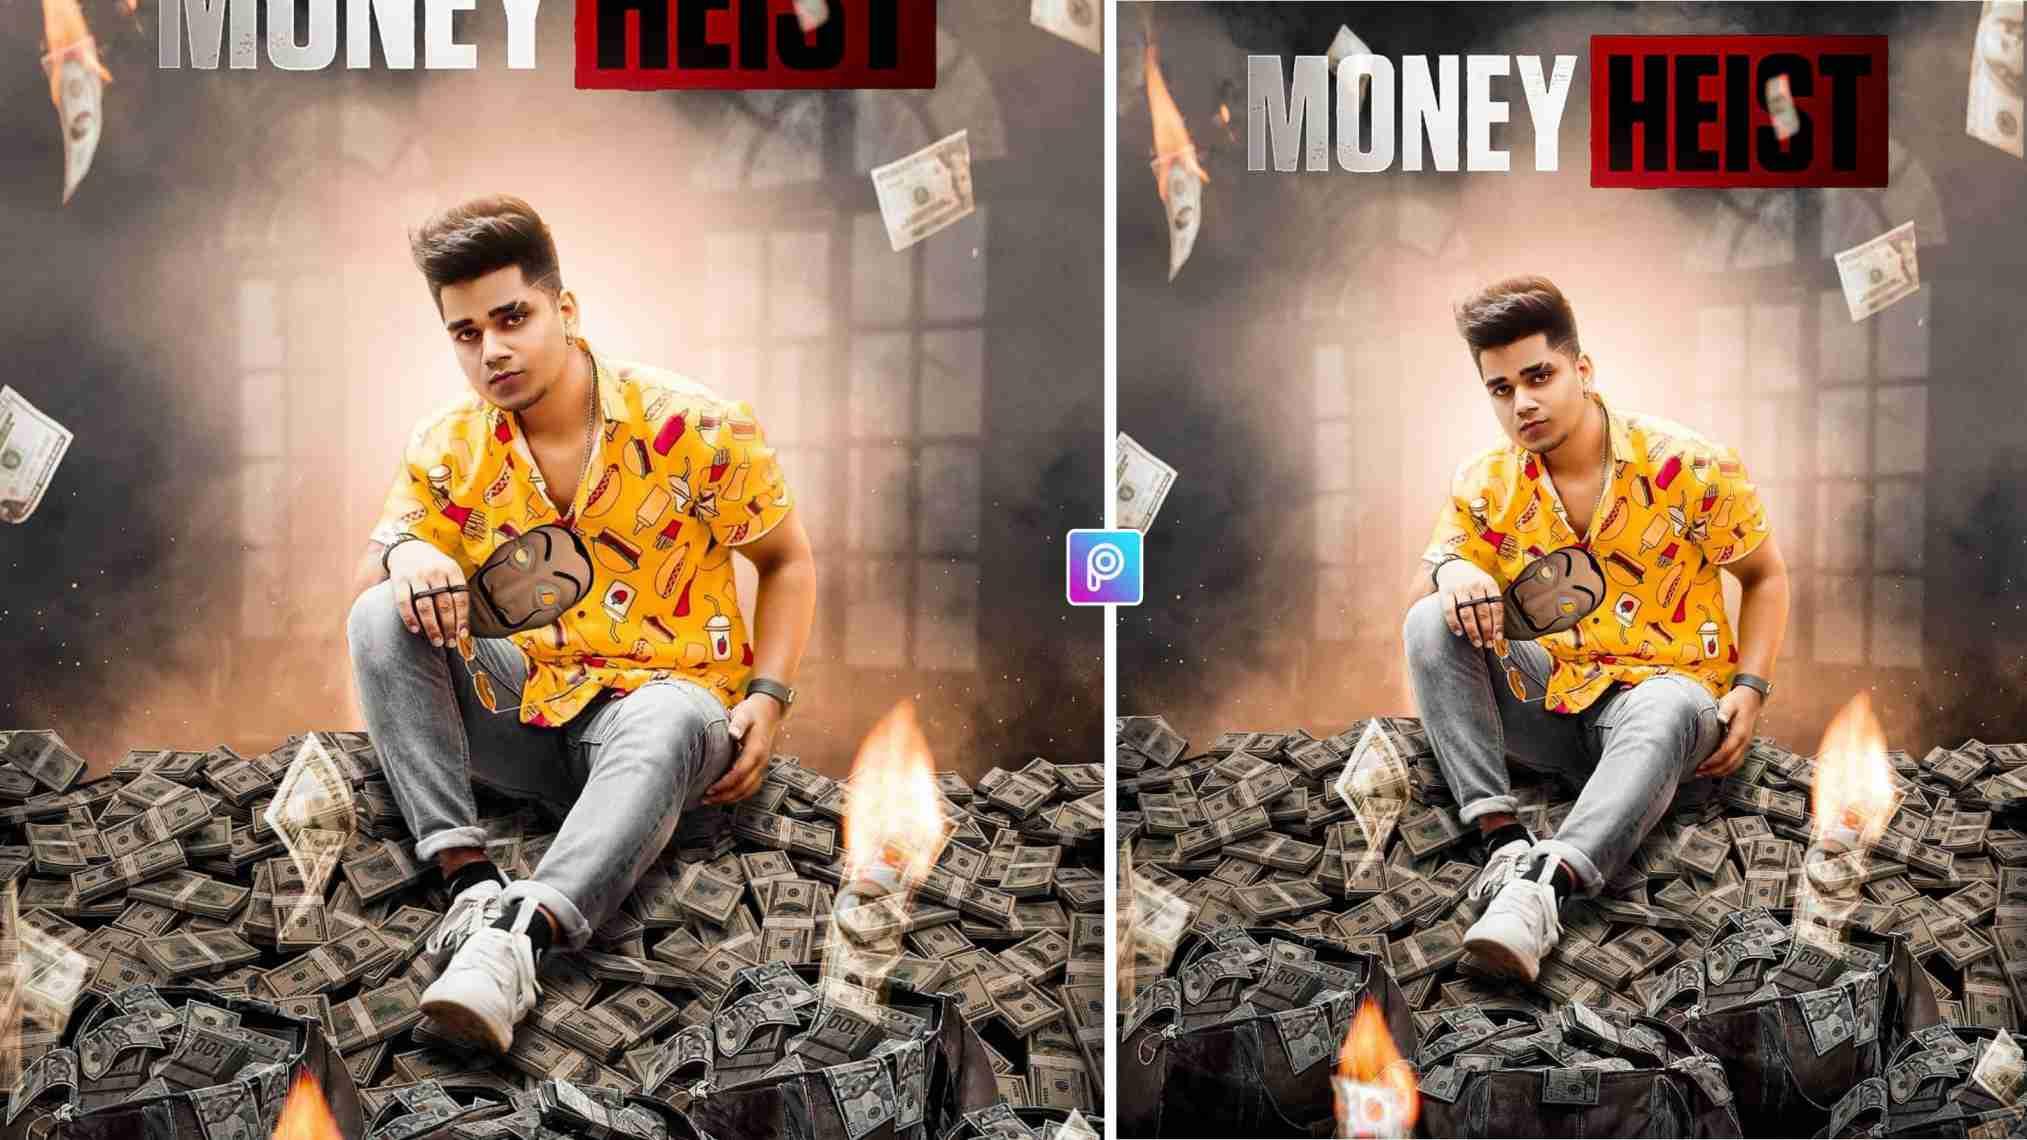 Money Heist Photo Editing